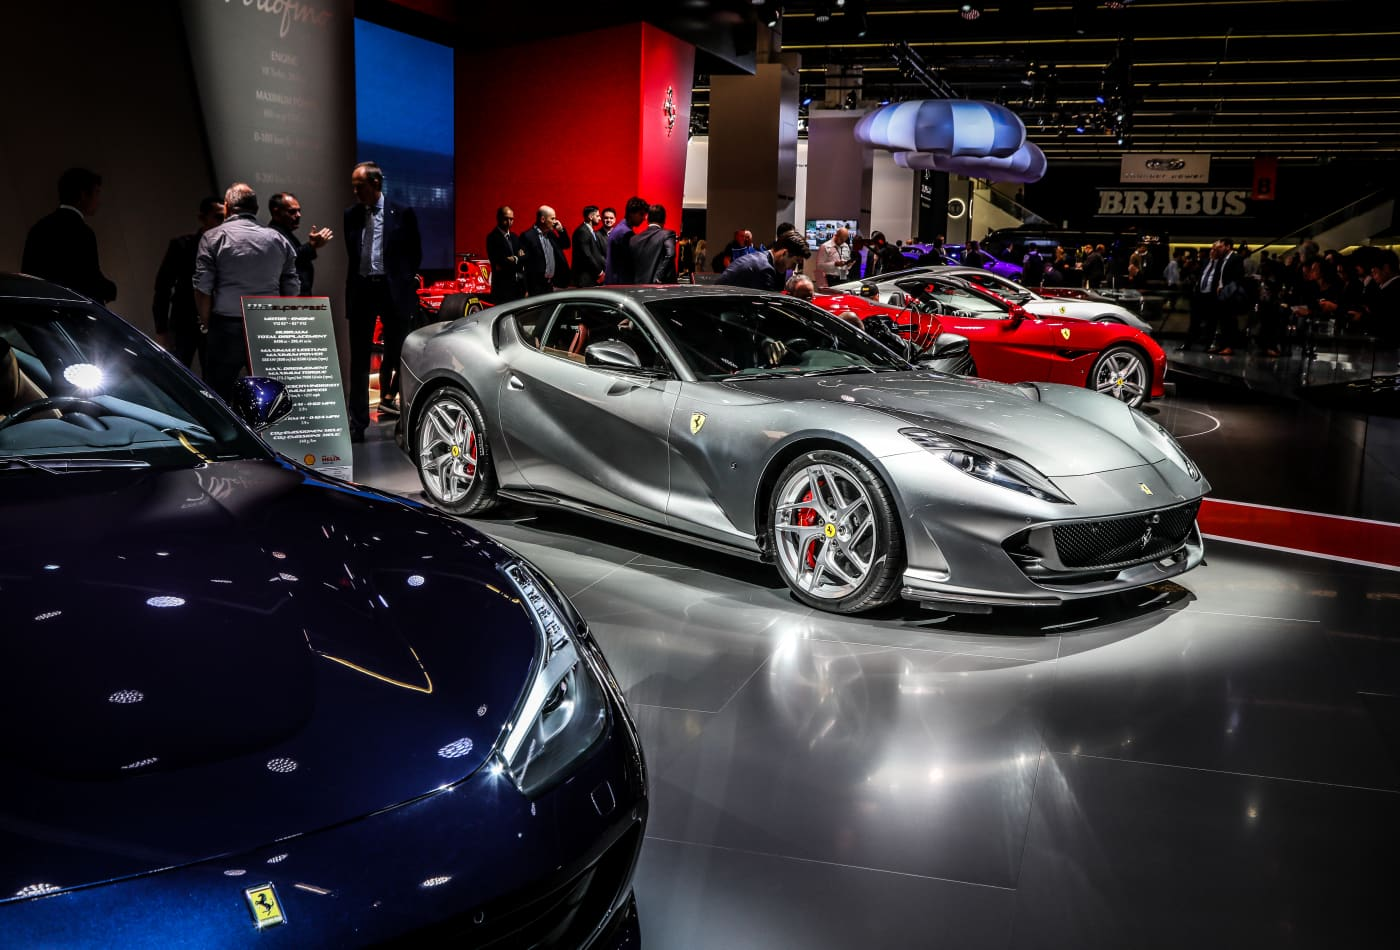 Average Pofit Ferrari Makes Per Car